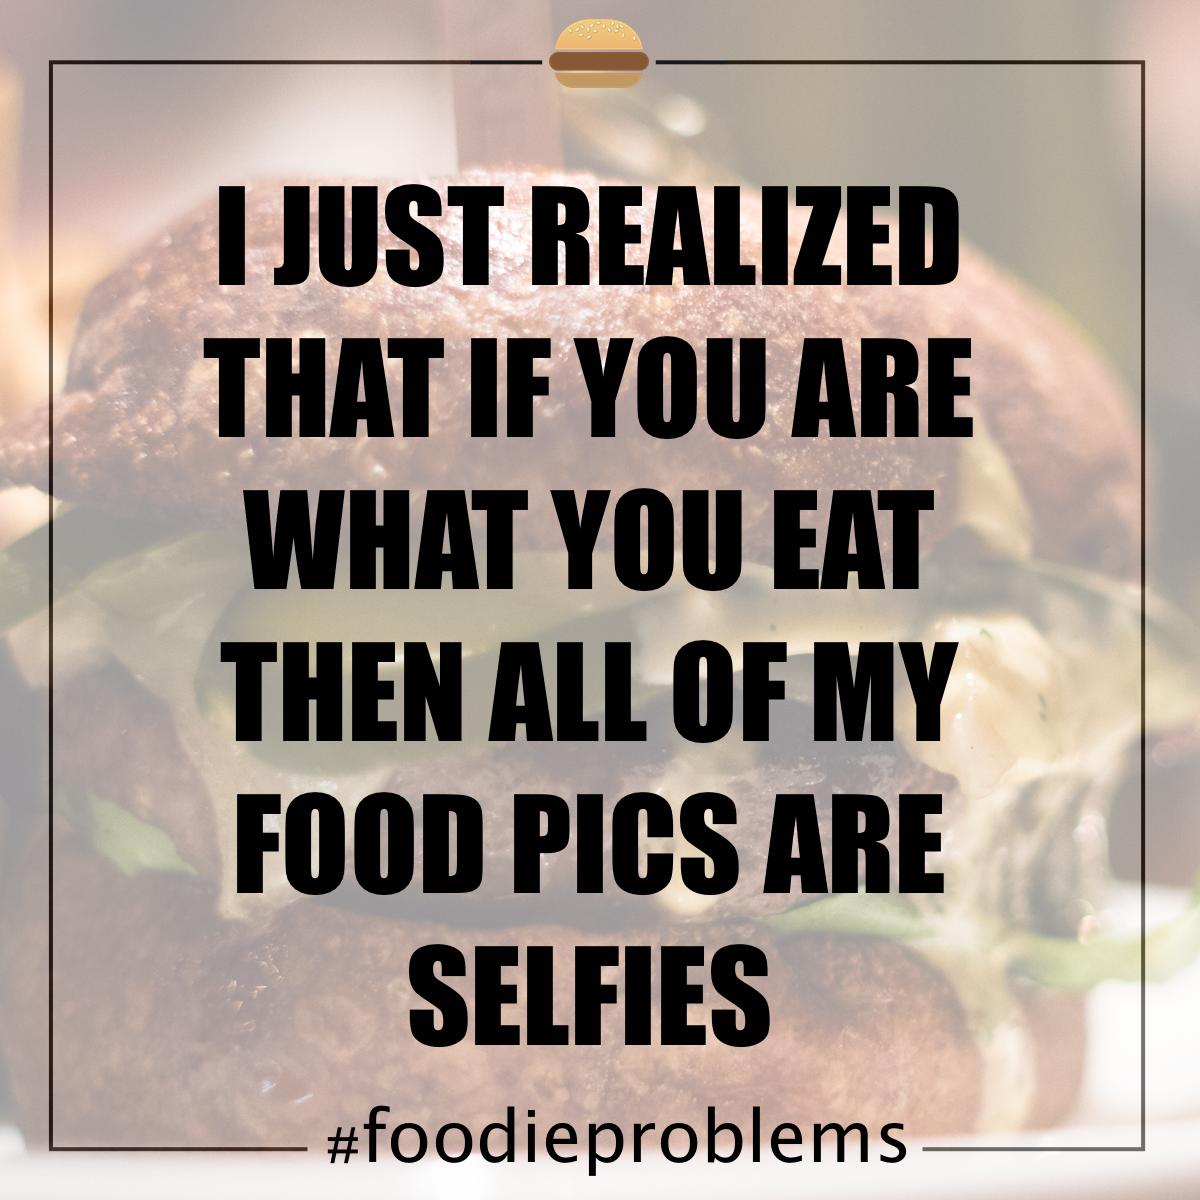 food pics = selfies